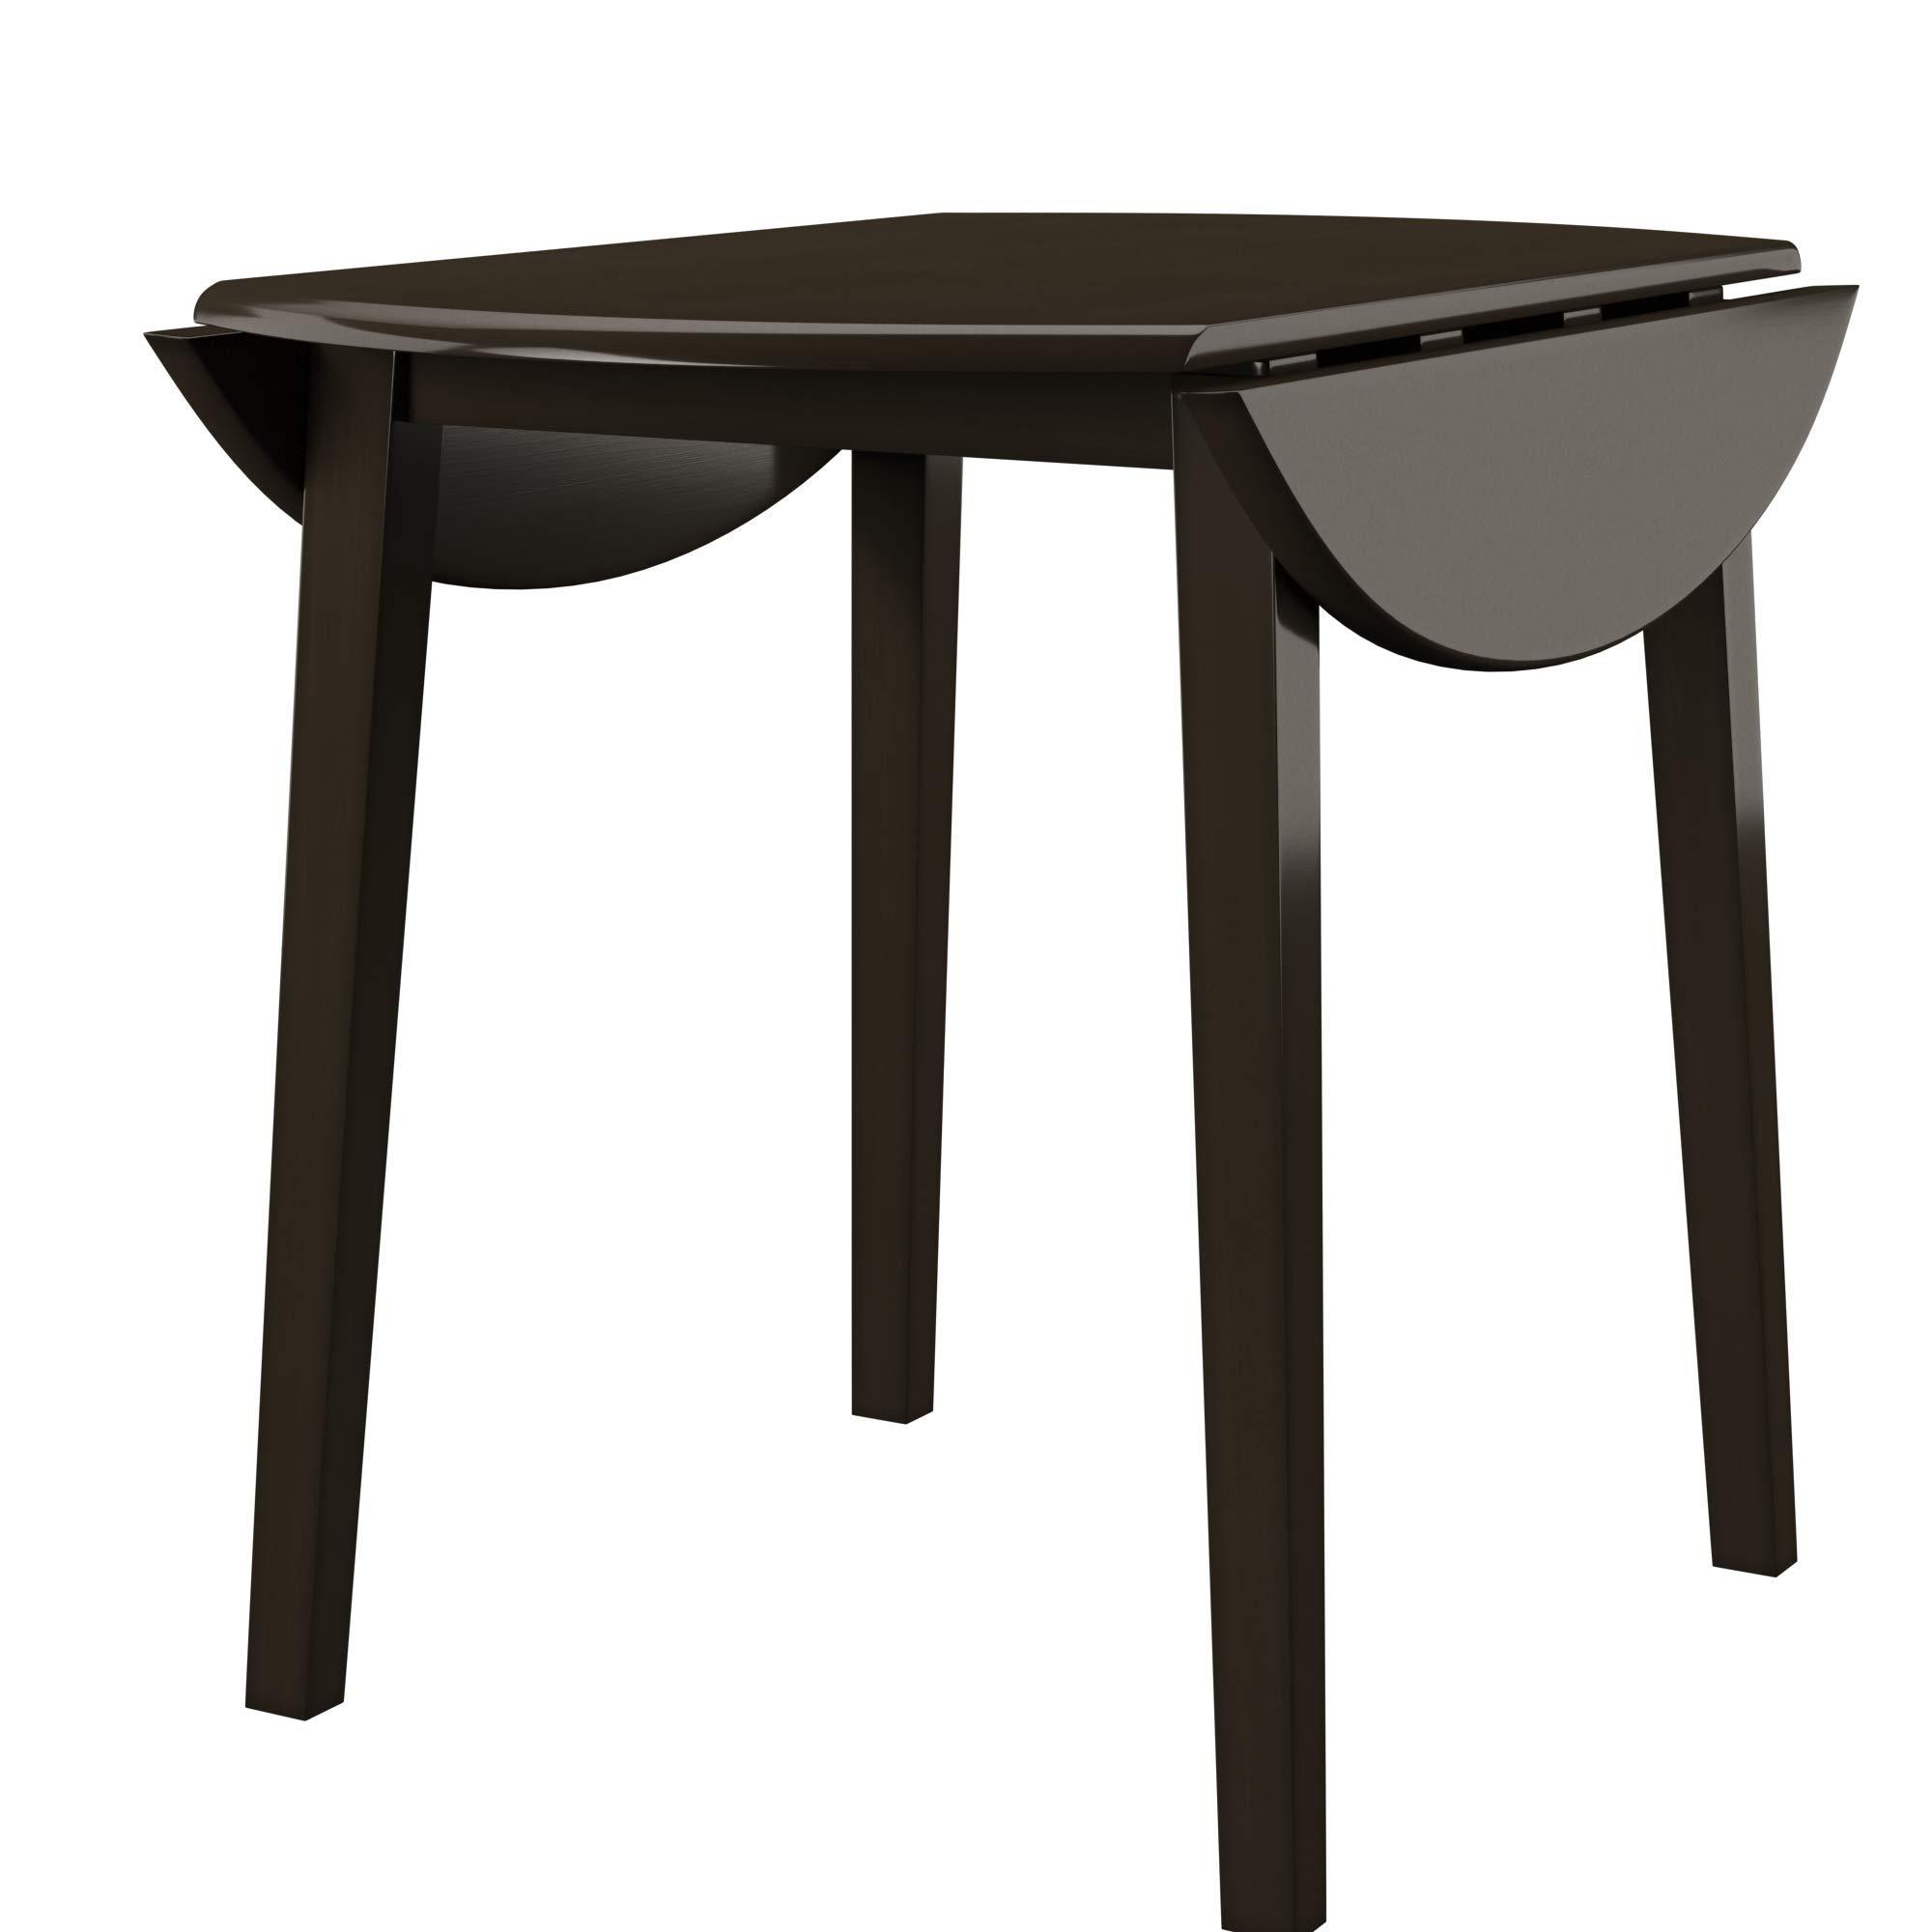 Ashley Furniture Signature Design - Hammis Dining Room Table - Drop Leaf Table - Dark Brown